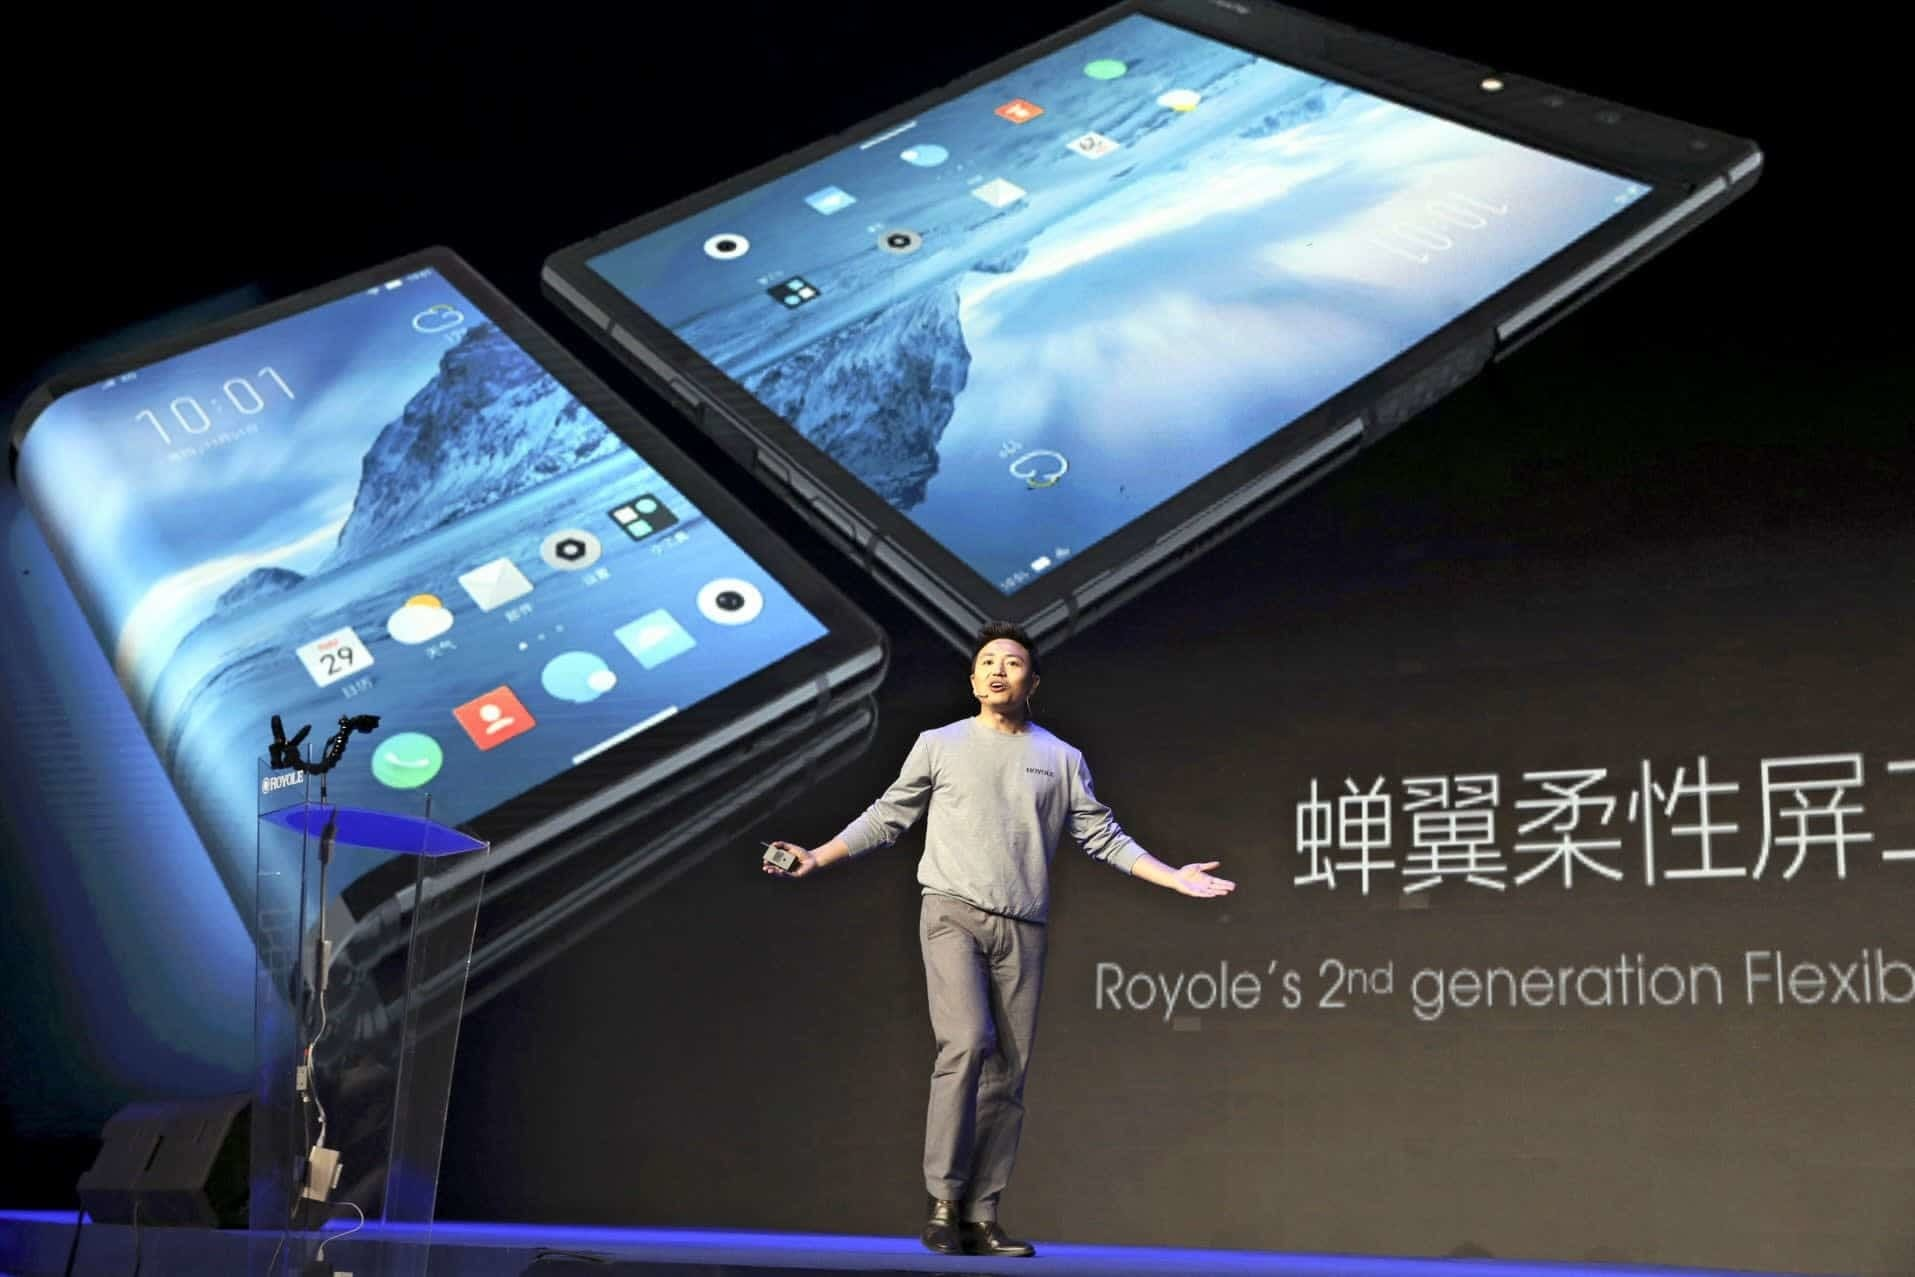 Foldable Smartphone Price In India: Xiaomi, Huawei, Apple, Samsung